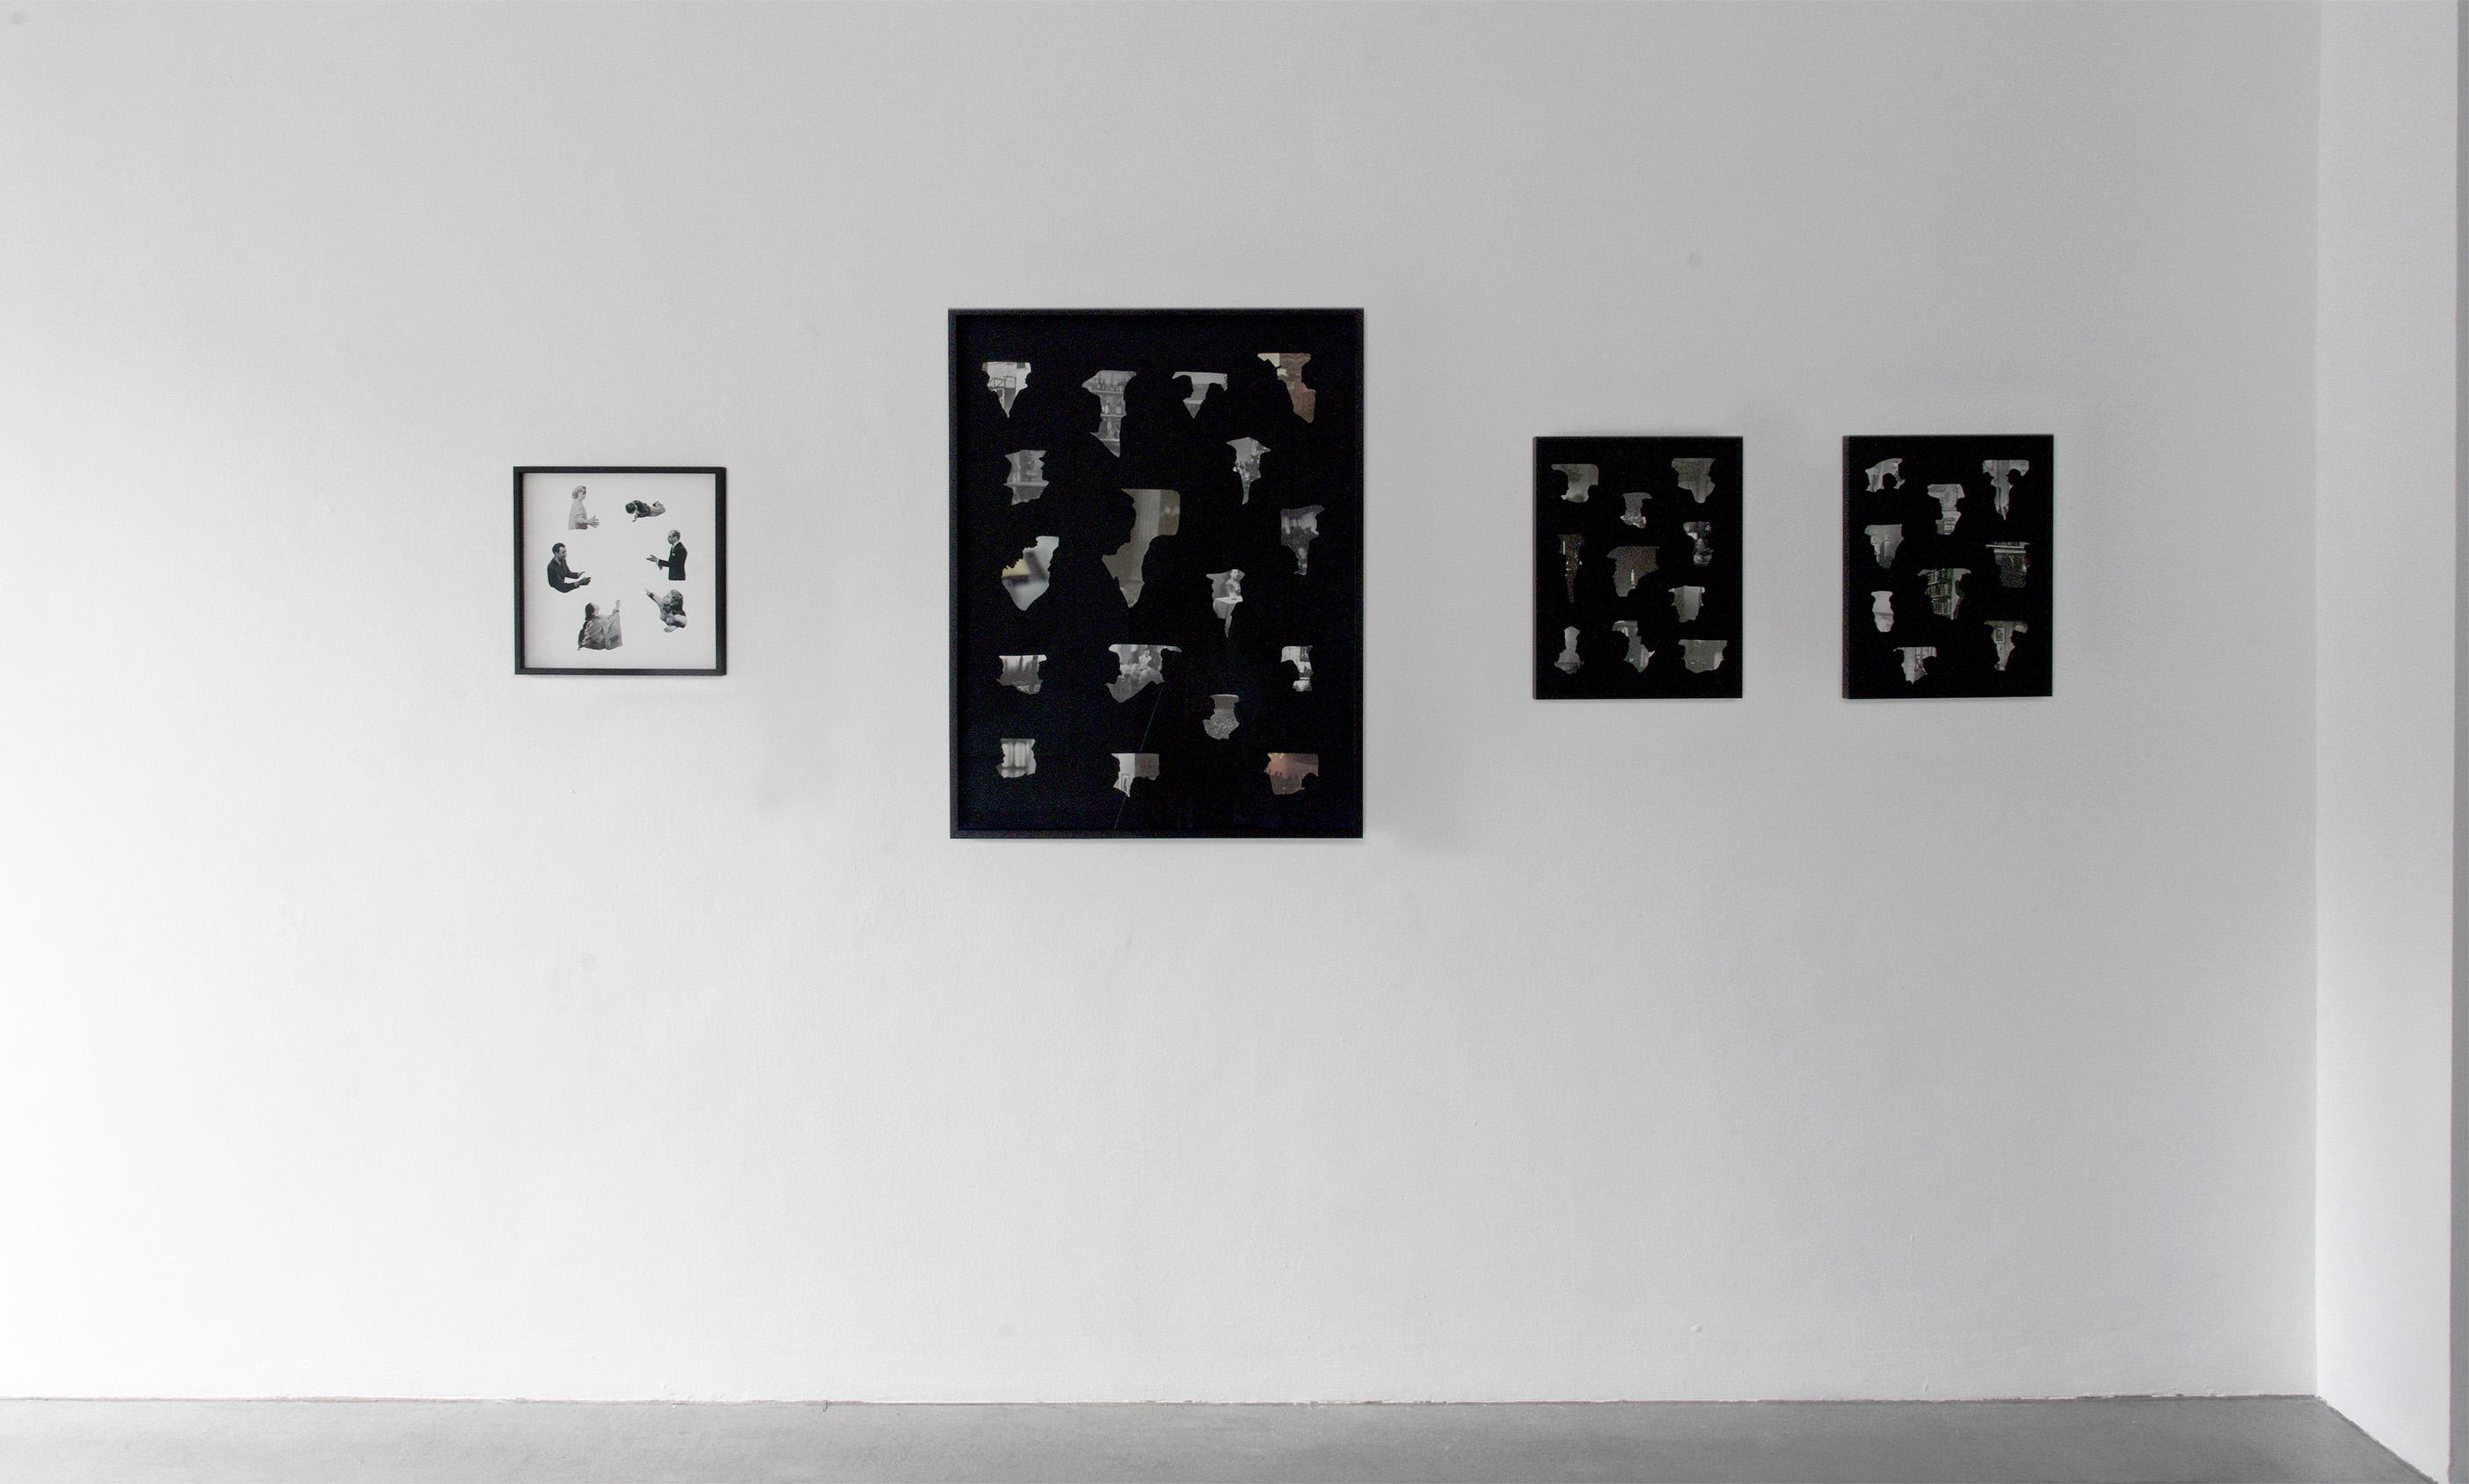 gallery raum mit licht, art show, domino, group, growing